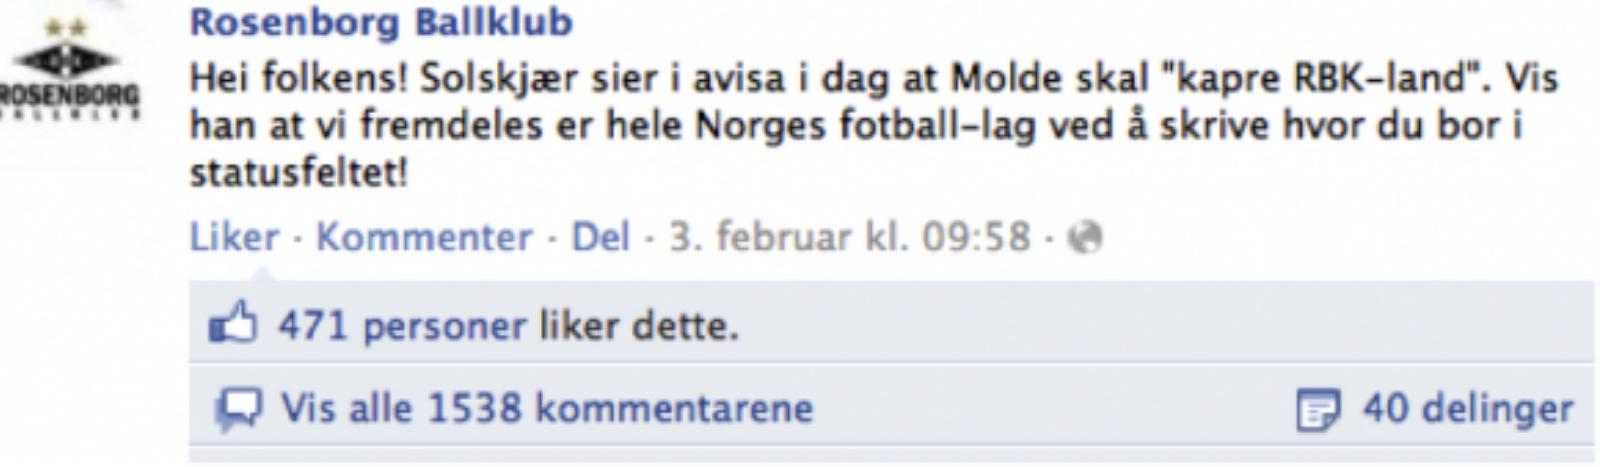 RBK Facebook